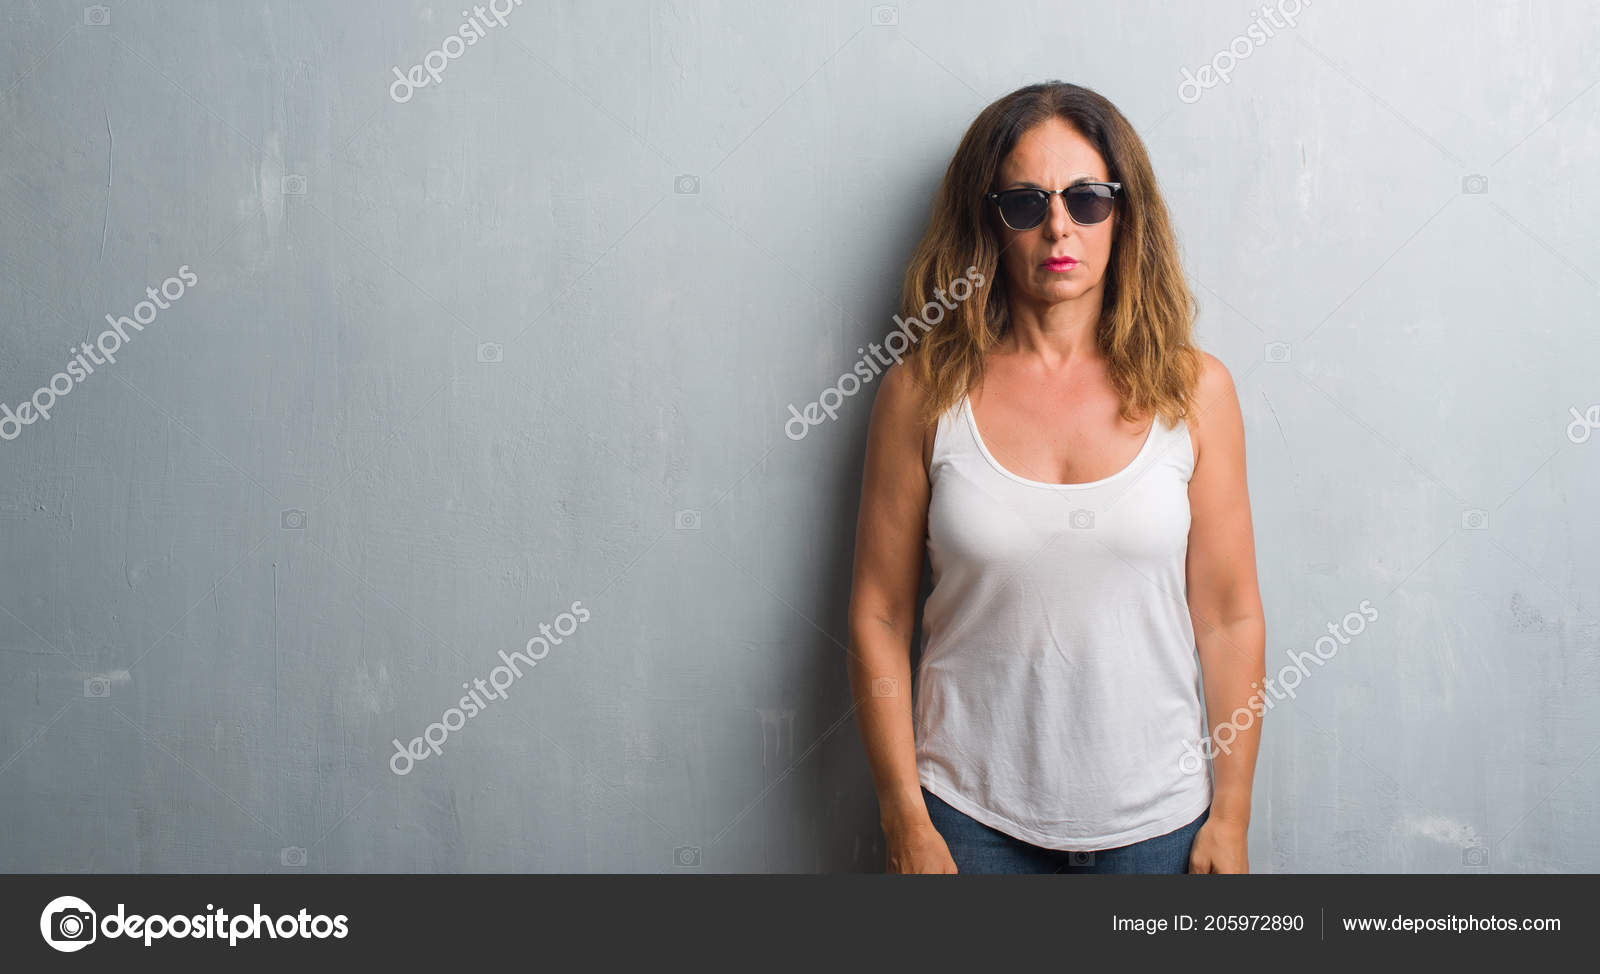 Middle Age Hispanic Woman Grey Wall Wearing Sunglasses Serious